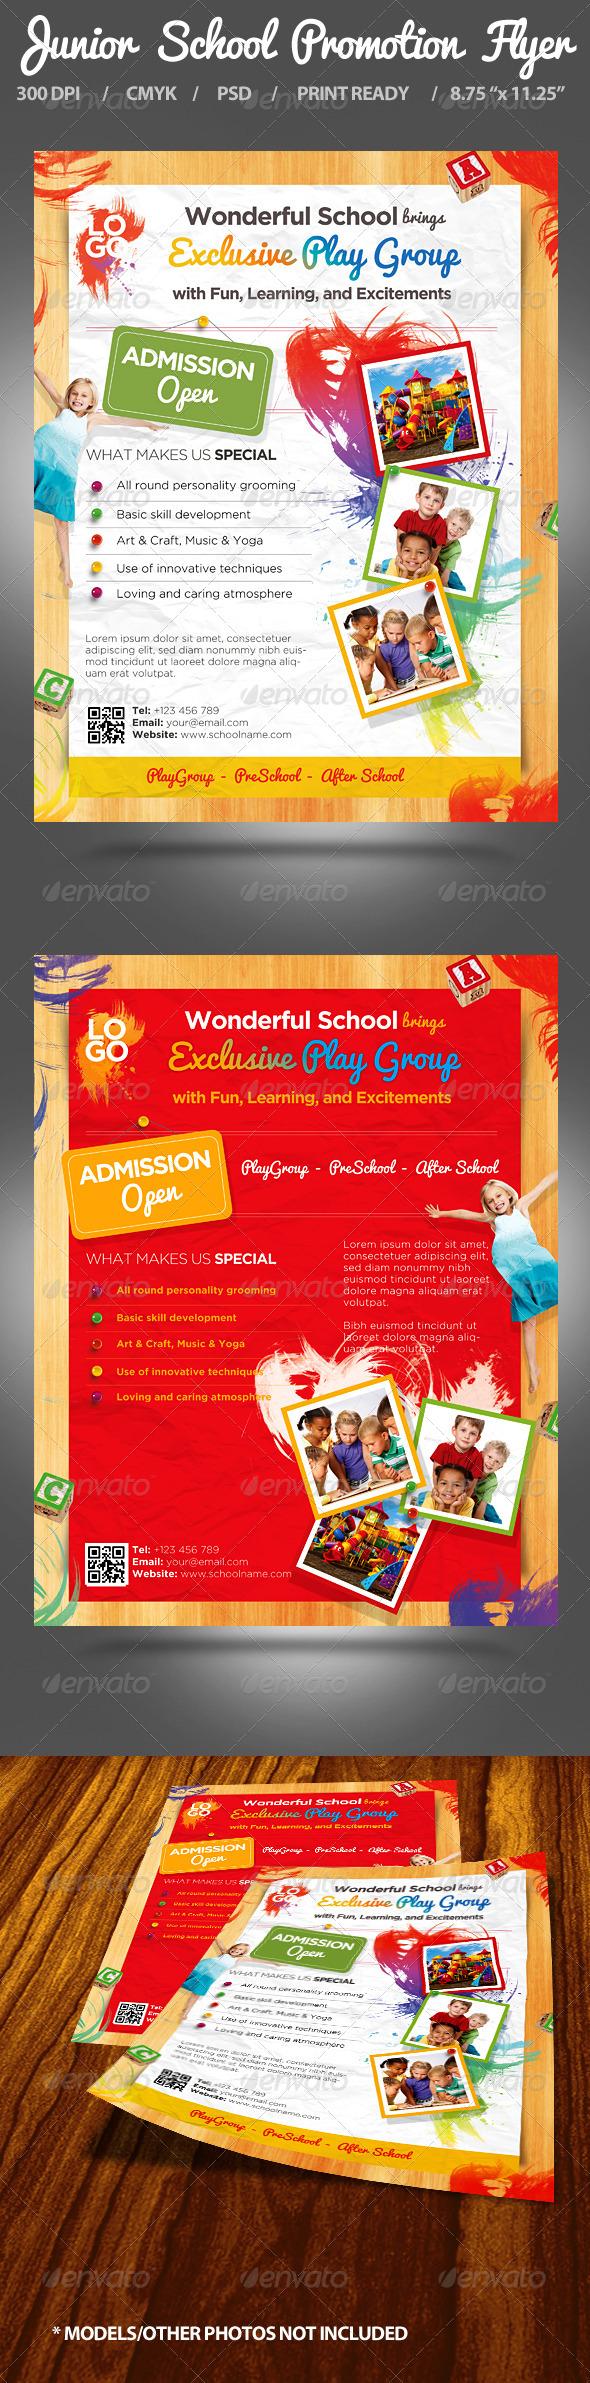 Junior School Promotion Flyers - Miscellaneous Events